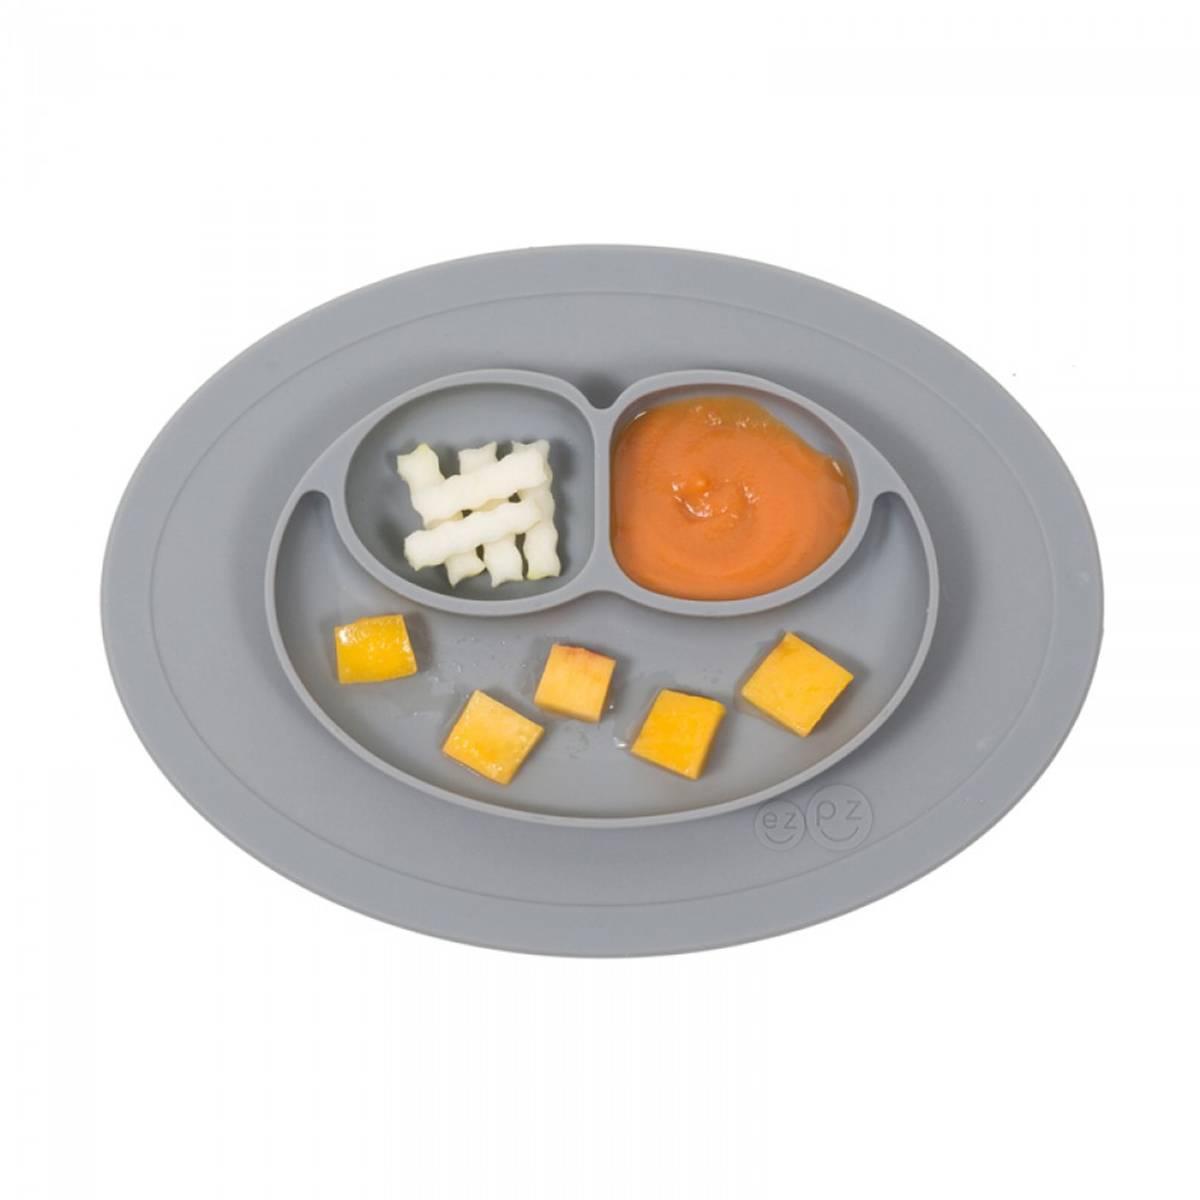 EZPZ | Mini mat | Grå